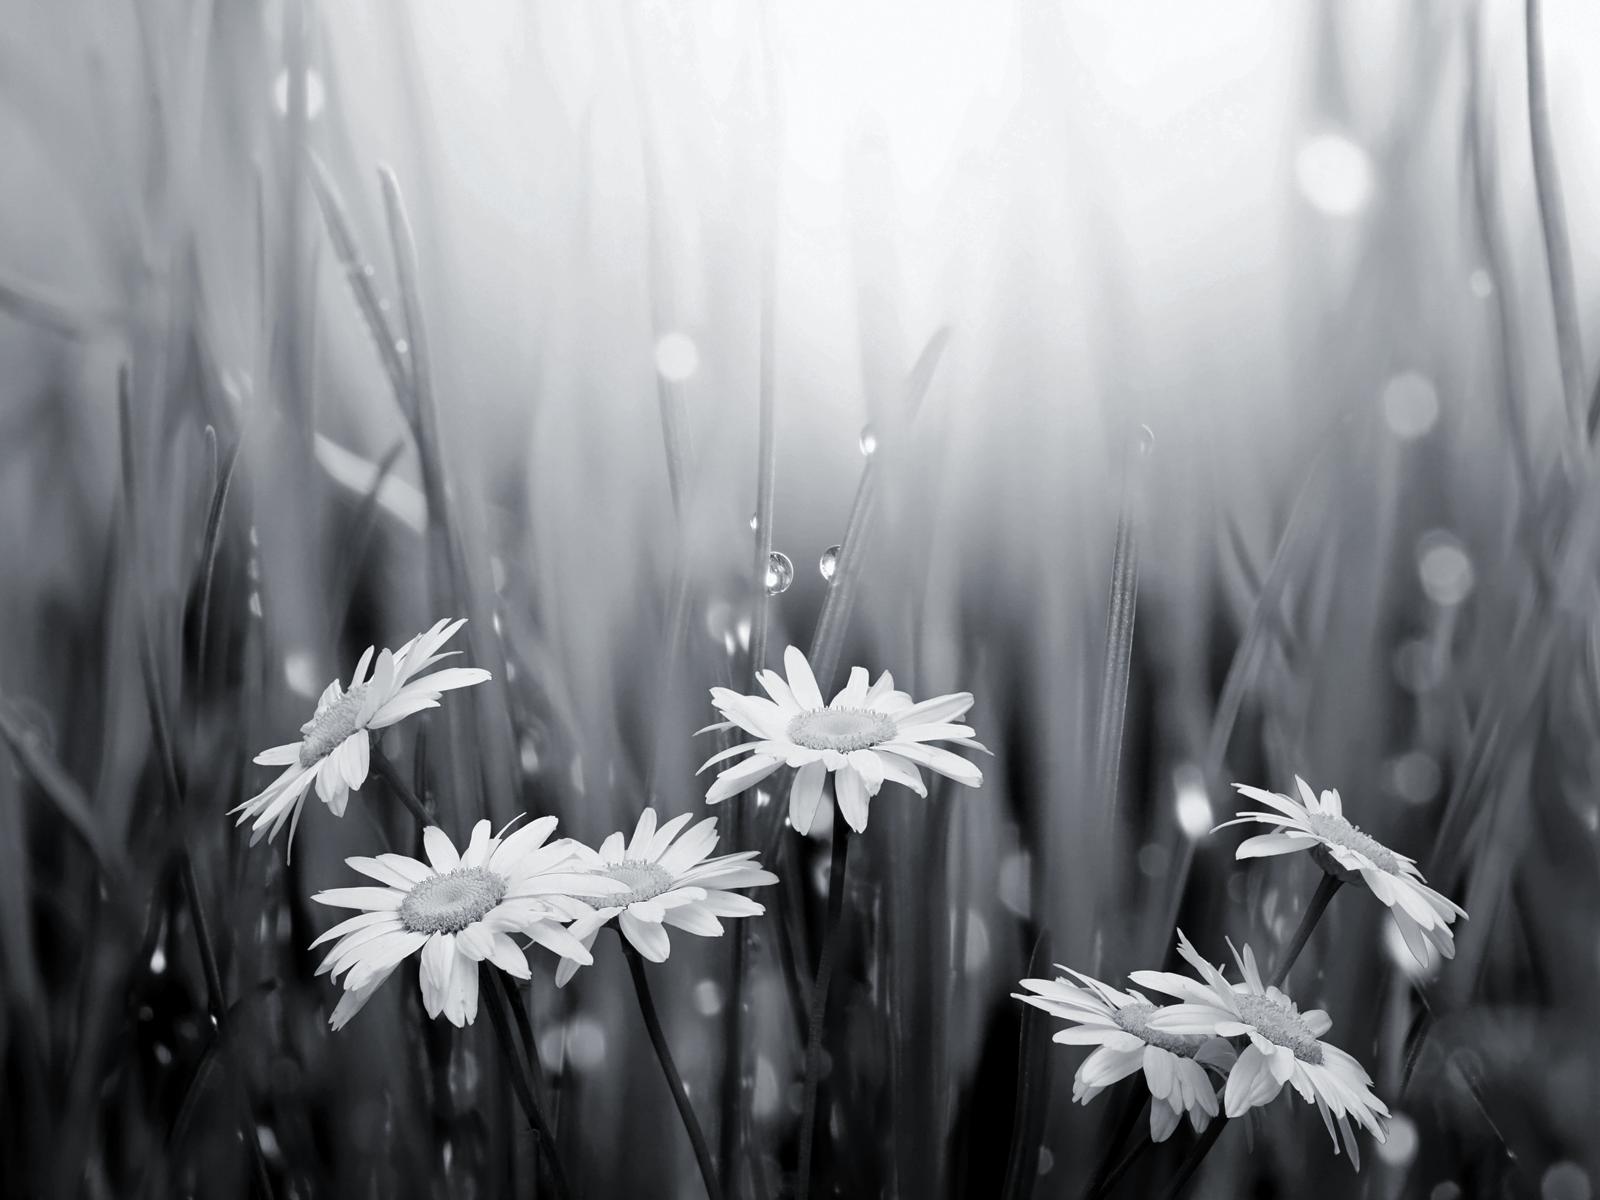 Raindrops Falling On Flowers Wallpaper Black And White Daisies And Raindrops Wallpaper Happy